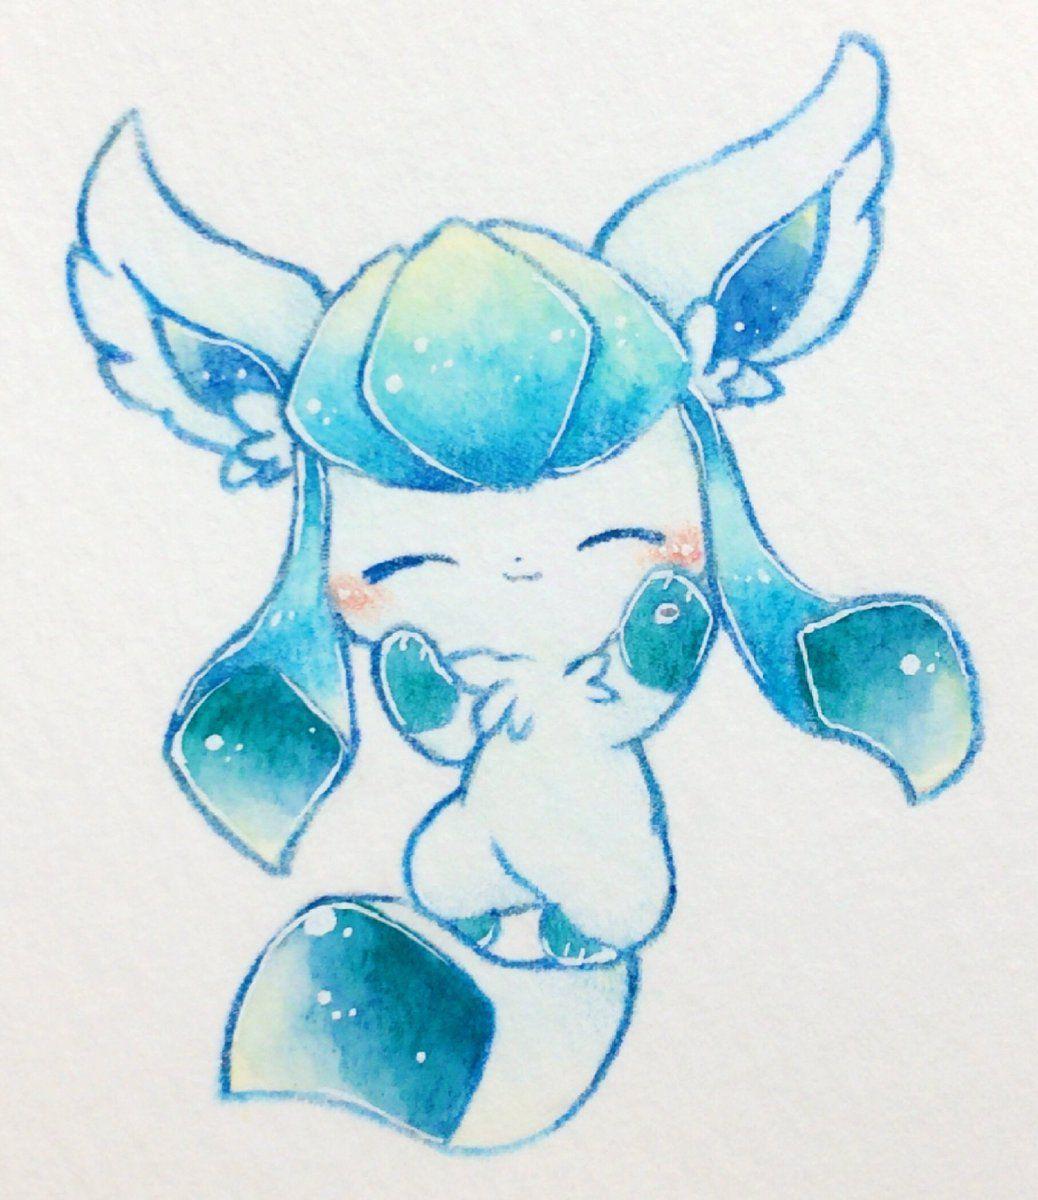 Glaceon Pokemon Desenho Desenhos Kawaii Personagens Pokemon